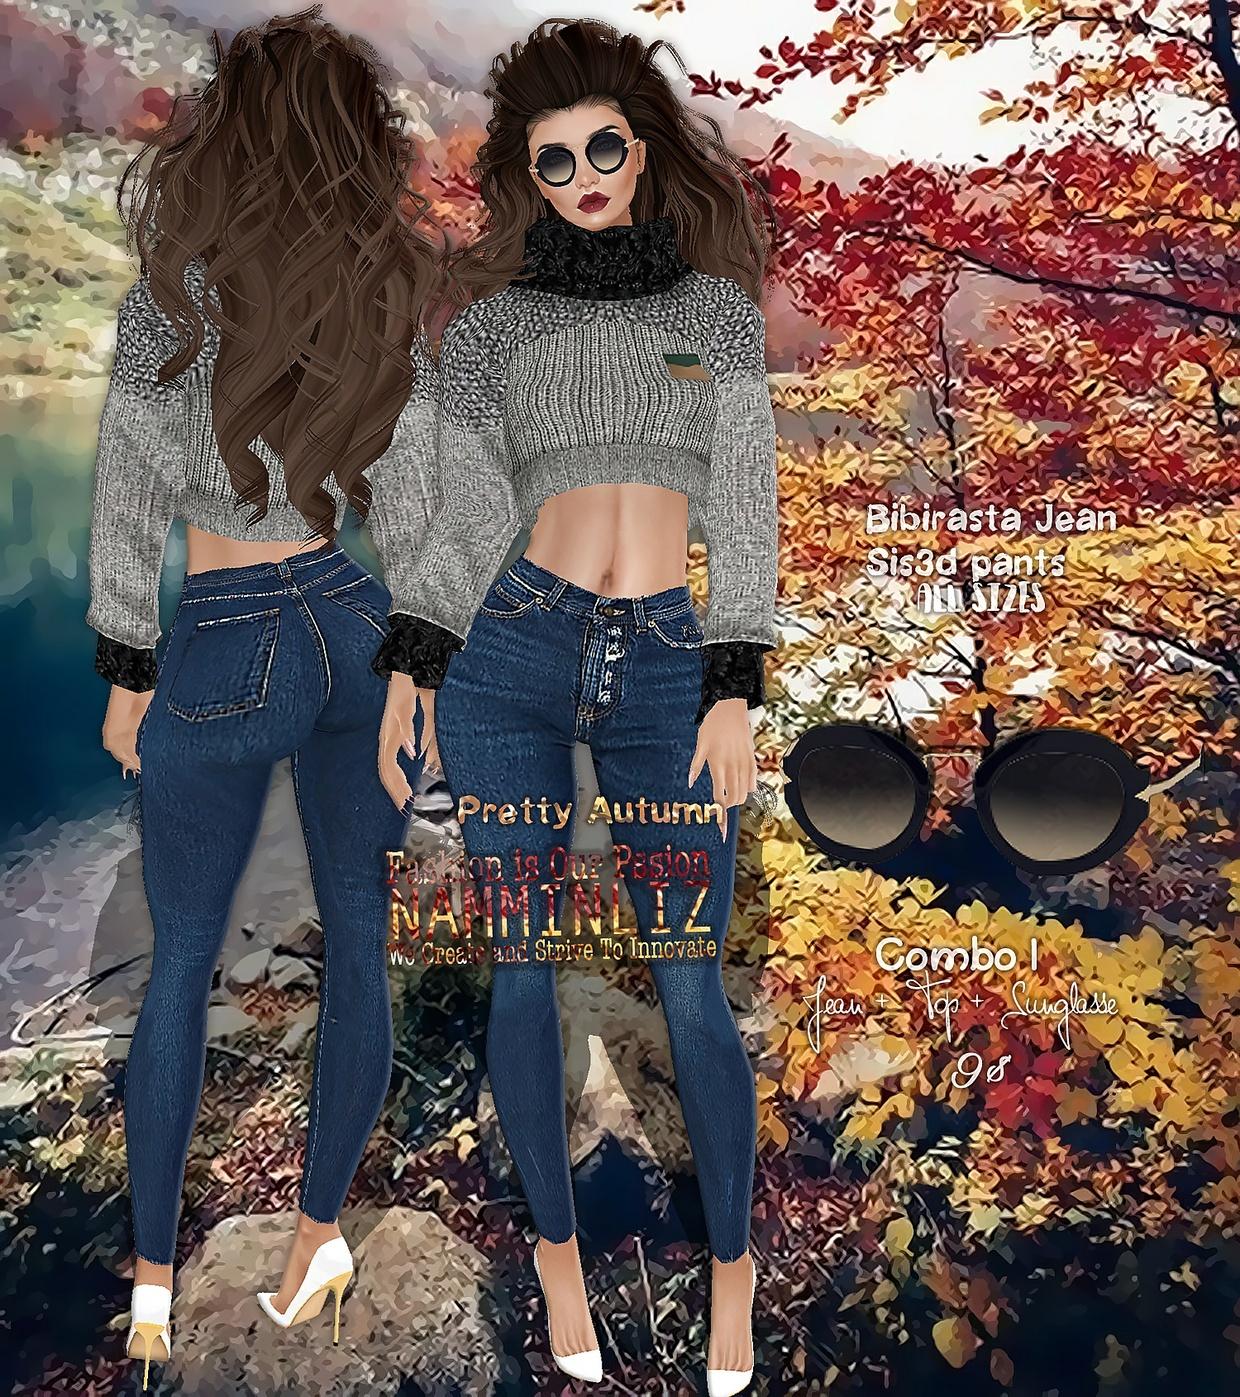 Pretty Autumn Full combo 2 Jeans Bibirasta/Sis3d + 2 Skirts Bibirasta + 4 Tops + 4 Sunglasses